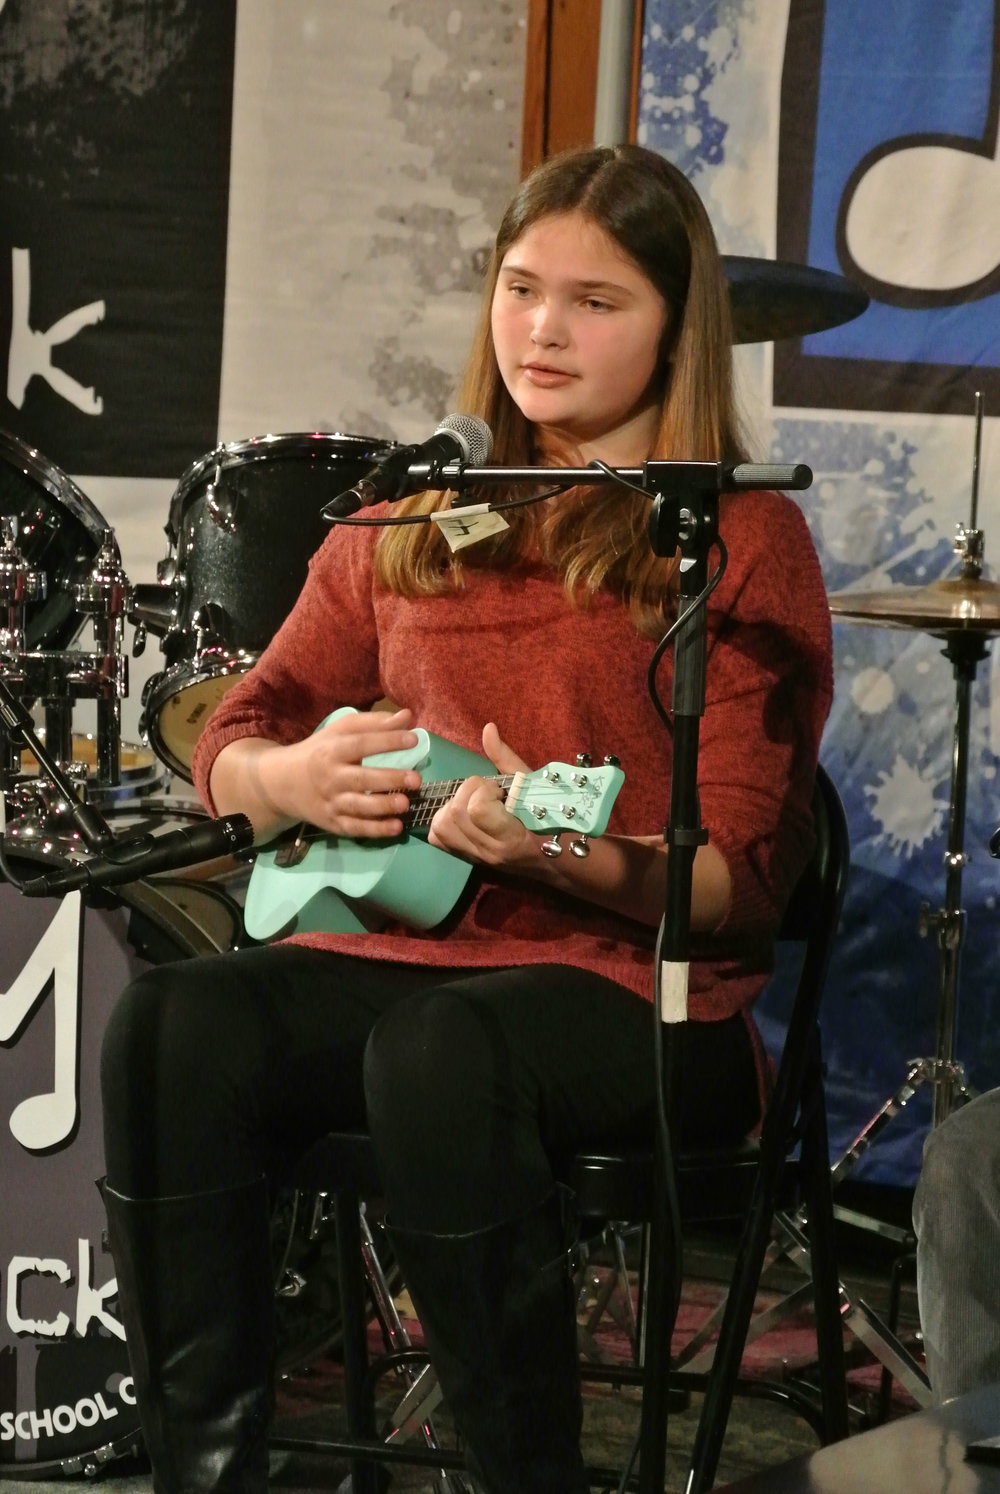 ukulele lessons Villanova pa in home main line